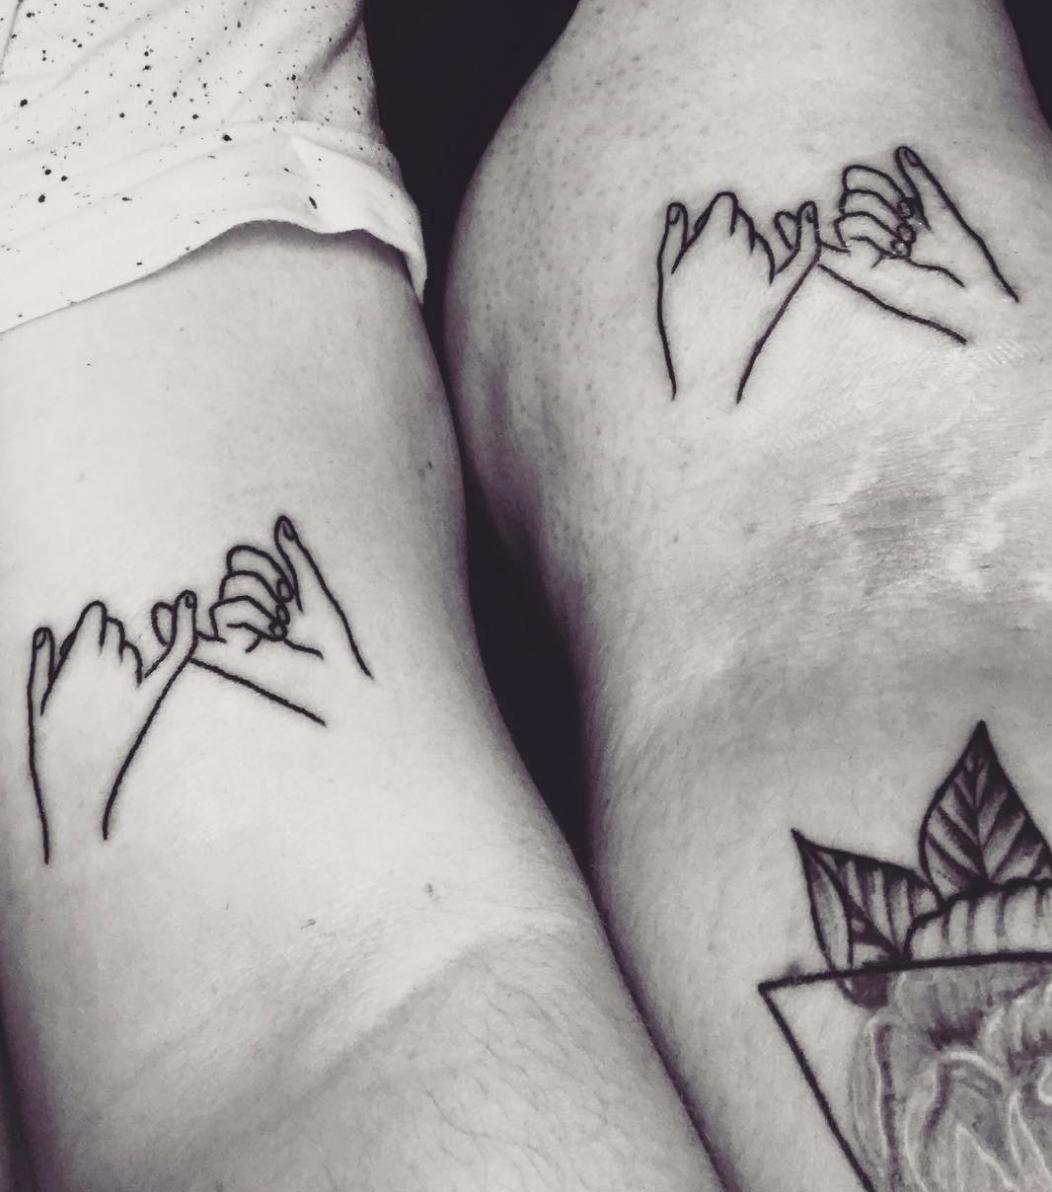 17 Minimalist Tattoo Ideas For Couples